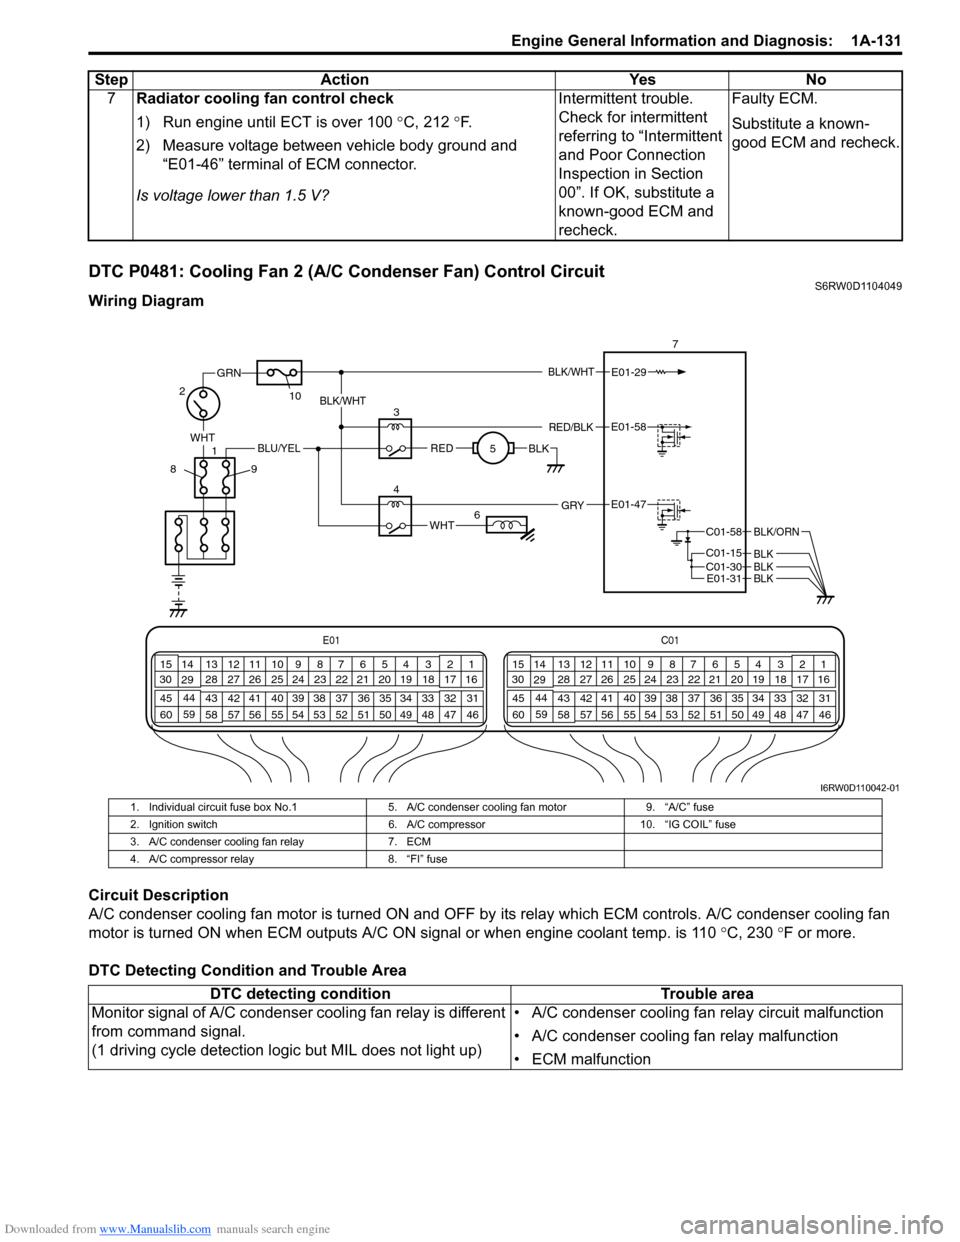 hight resolution of fuse box on suzuki sx4 trusted wiring diagram suzuki sx4 engine fuse box on suzuki sx4